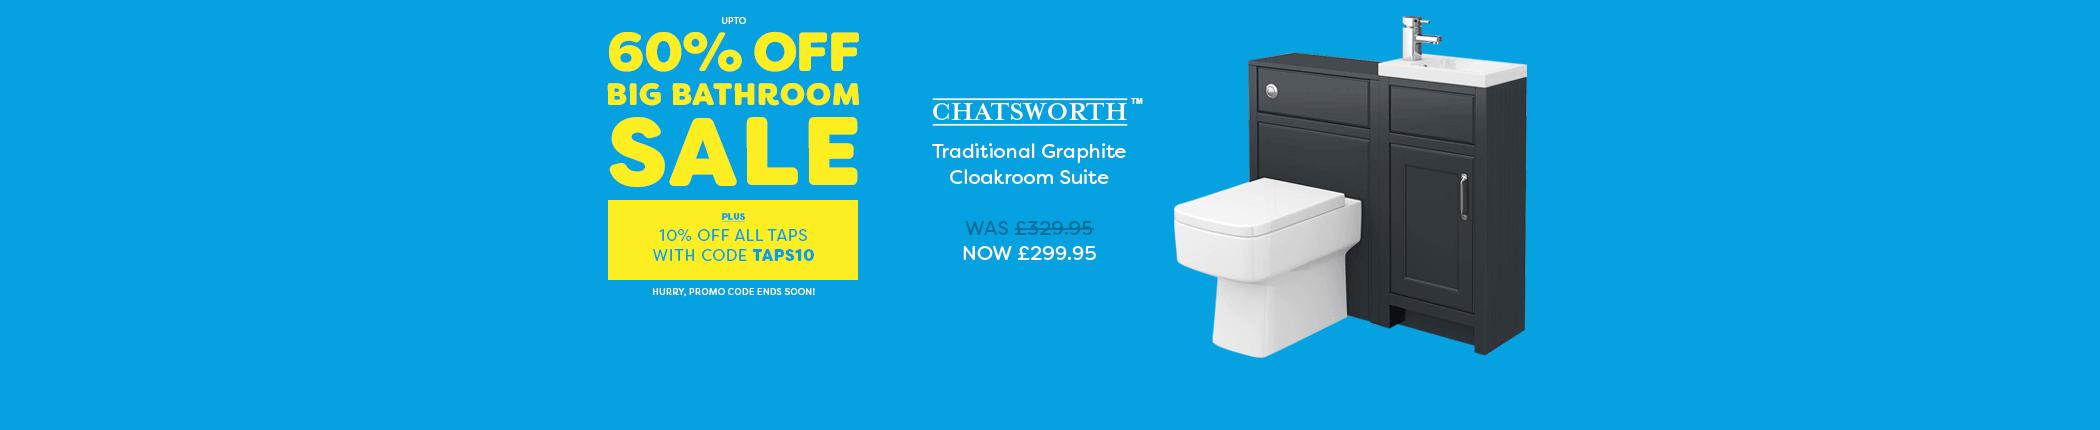 big-bathroom-sale-10-off-taps-chatsworth-traditional-graphite-countdown-may17-hbnr